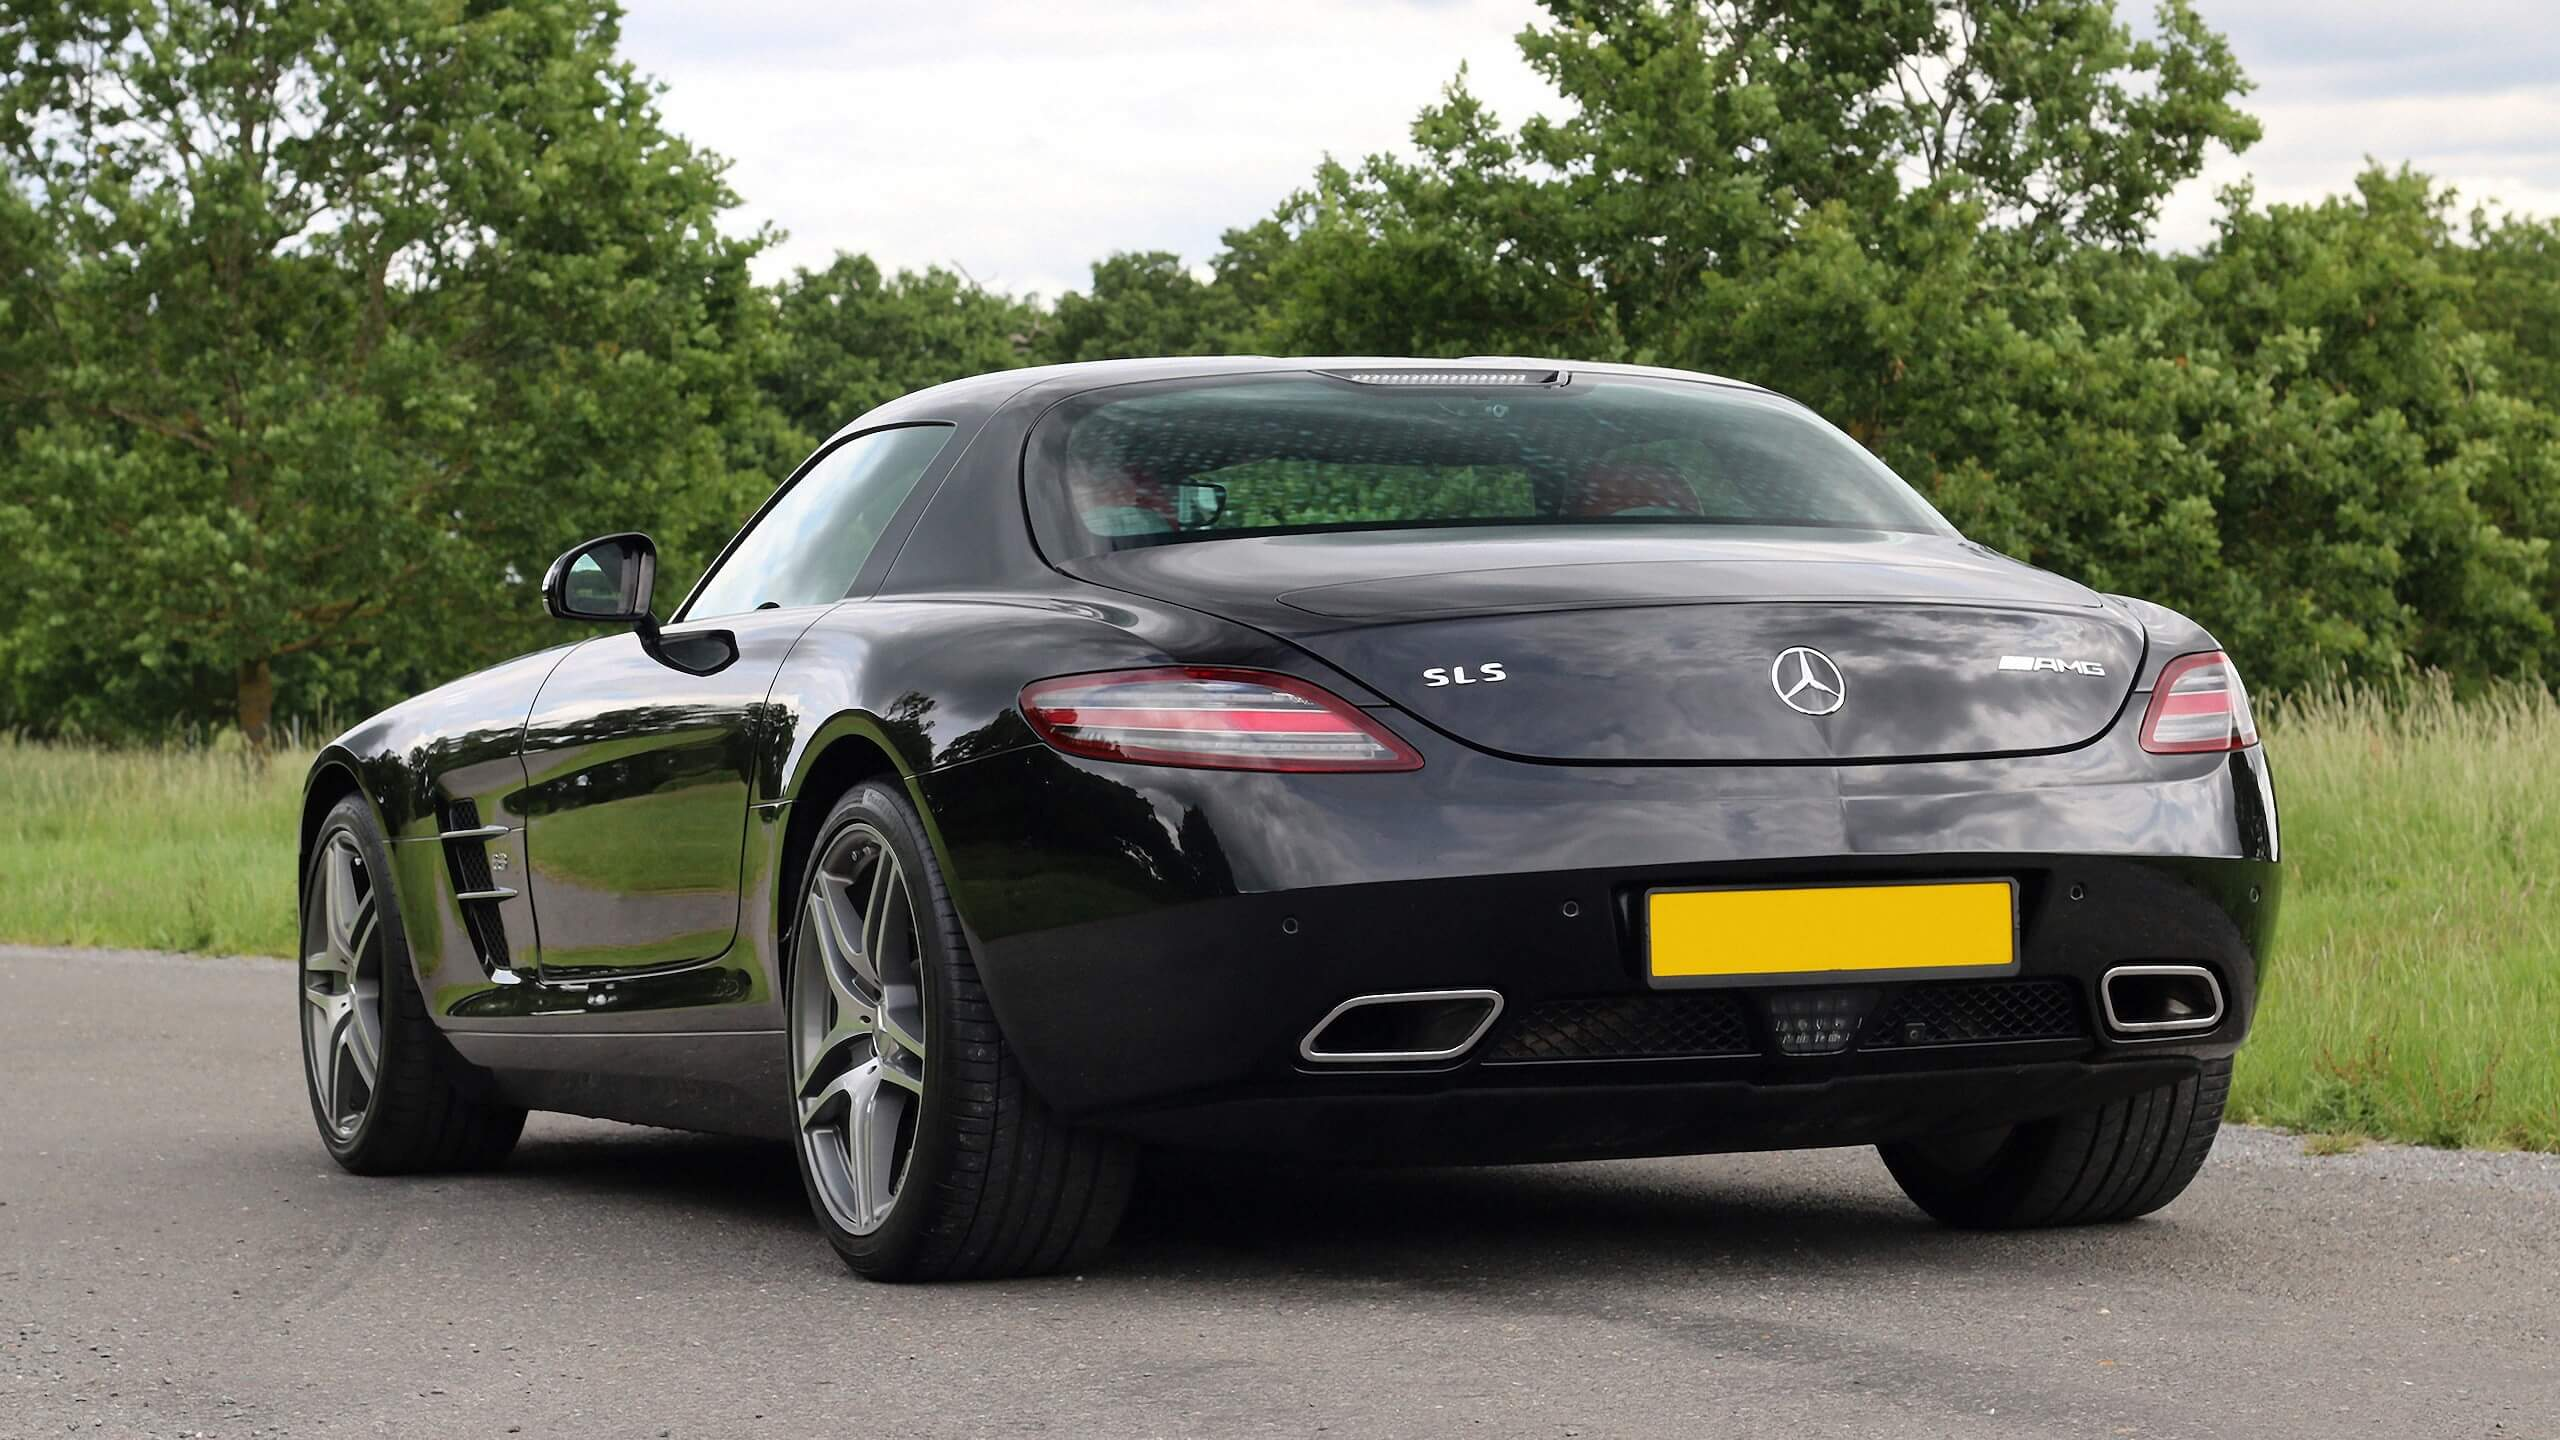 Mercedes-Benz SLS AMG (Black), 2012 now for € 160,739